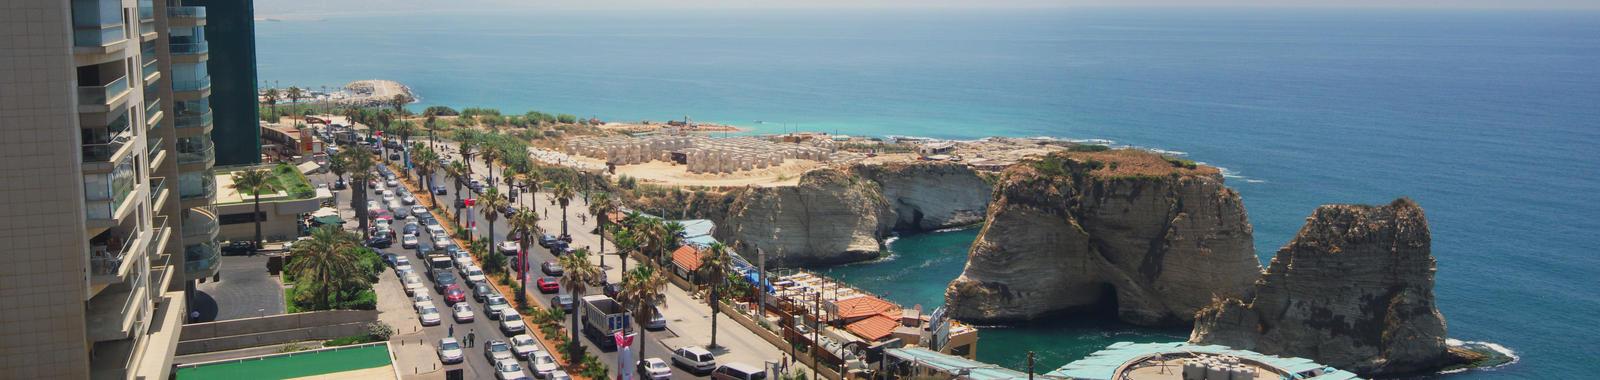 Raouche Rock - Beirut, Lebanon by SerenissimaLuna